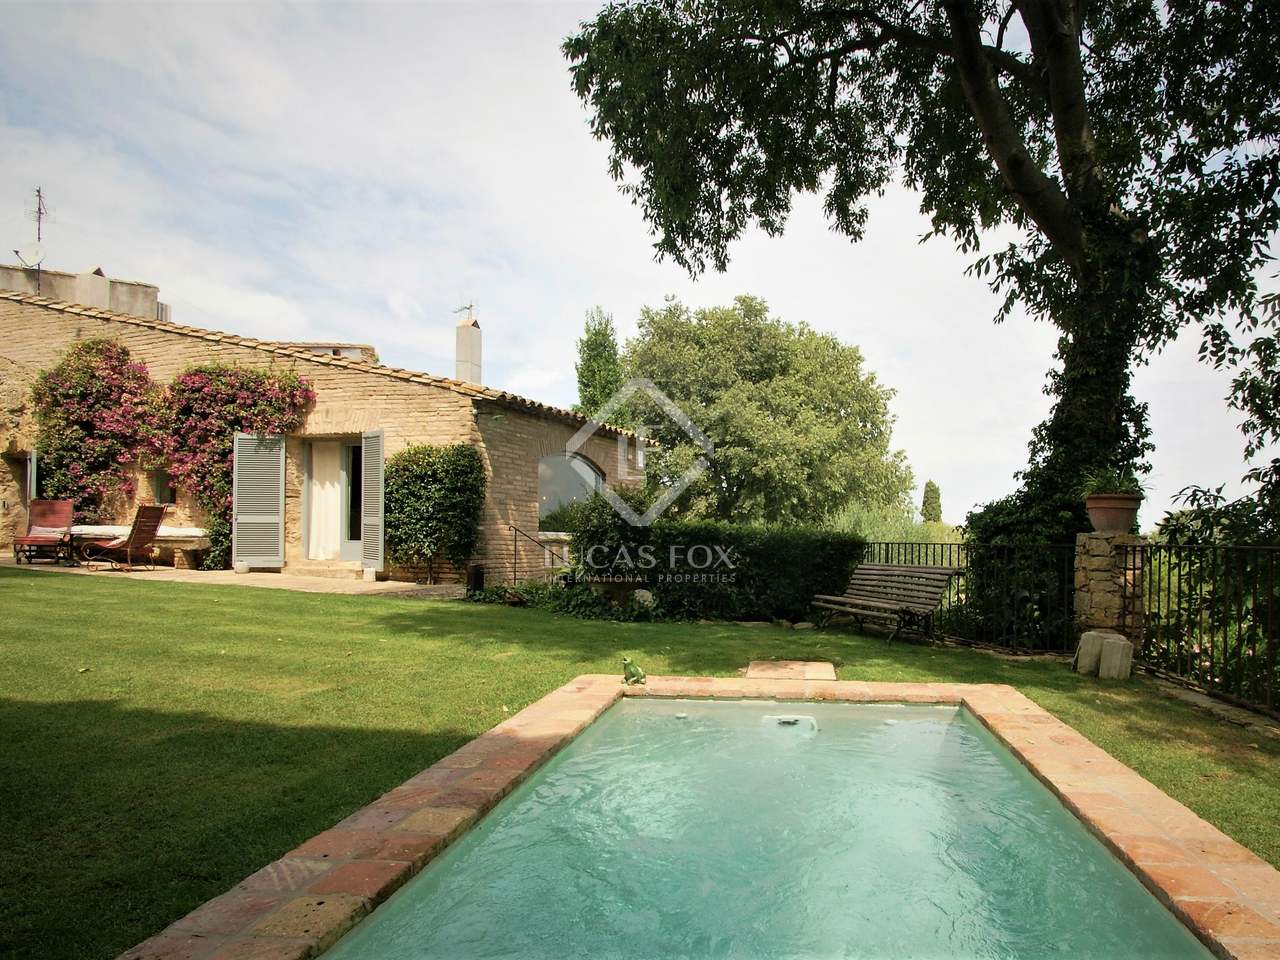 Huis villa van 300m te koop met 217m tuin in baix emporda for Huis te koop borgerhout met tuin